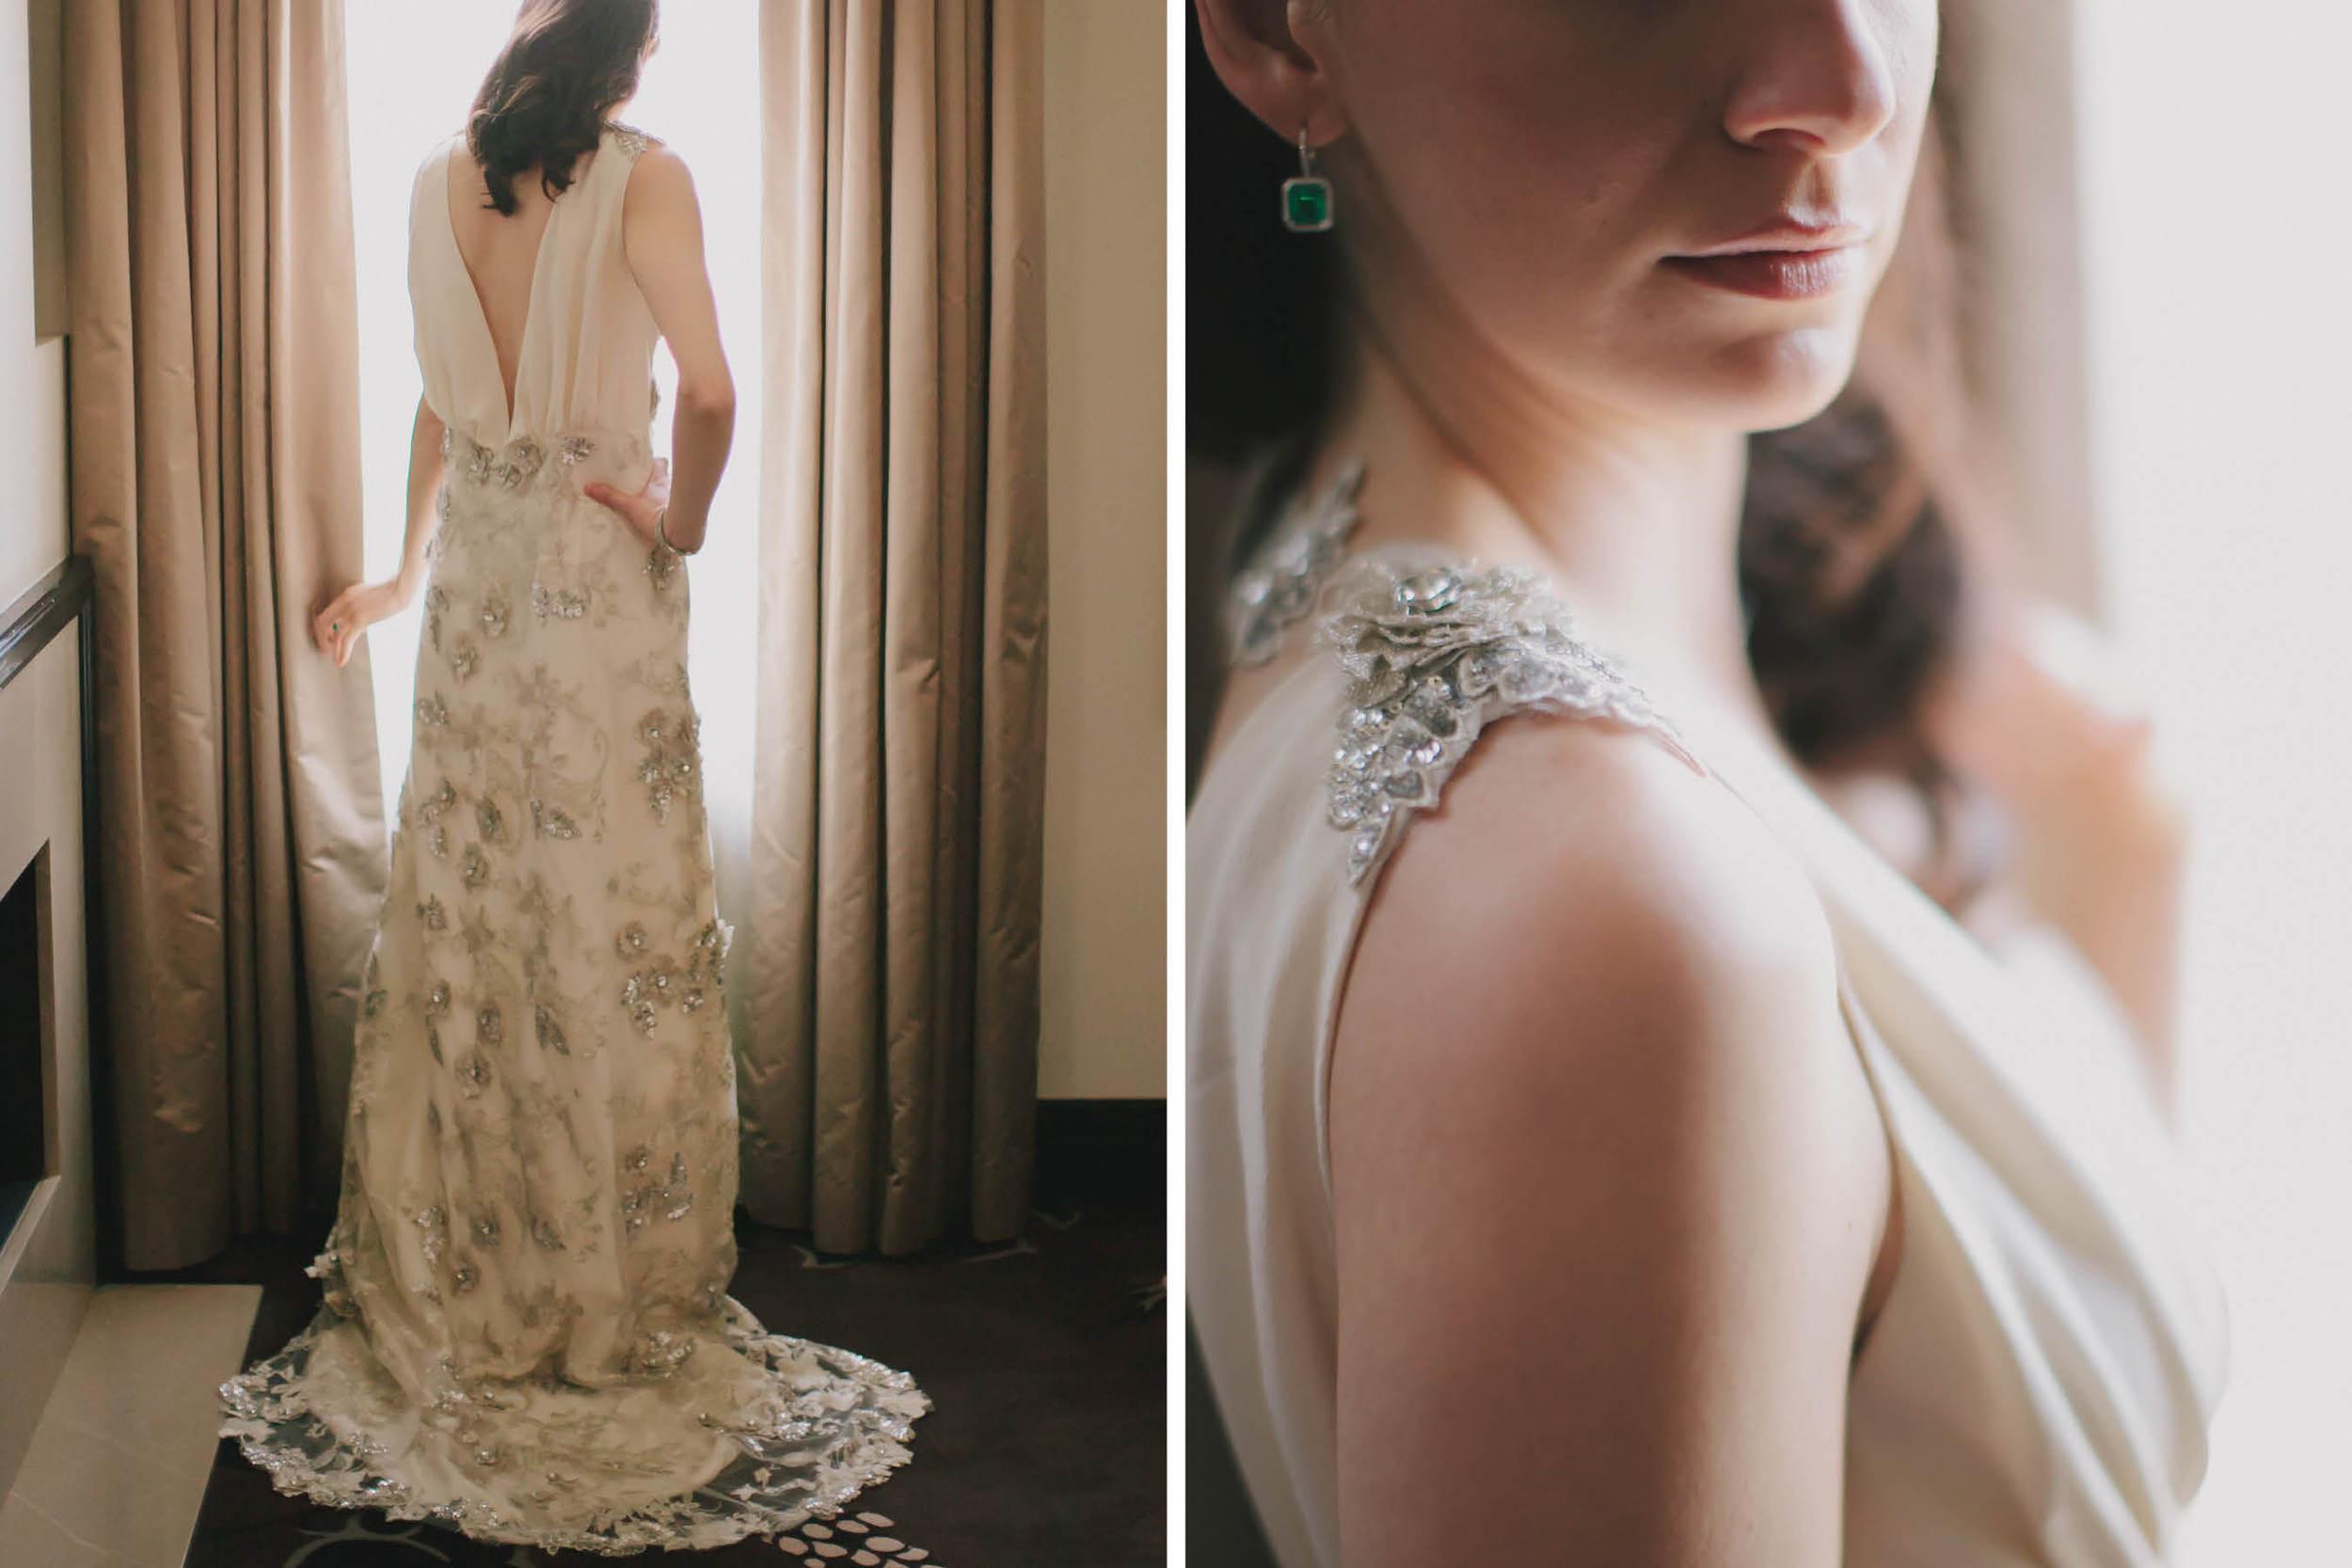 alegria-by-design-wedding-planner-coordinator-santa-barbara-montecito-inn-penthouse (13).jpg